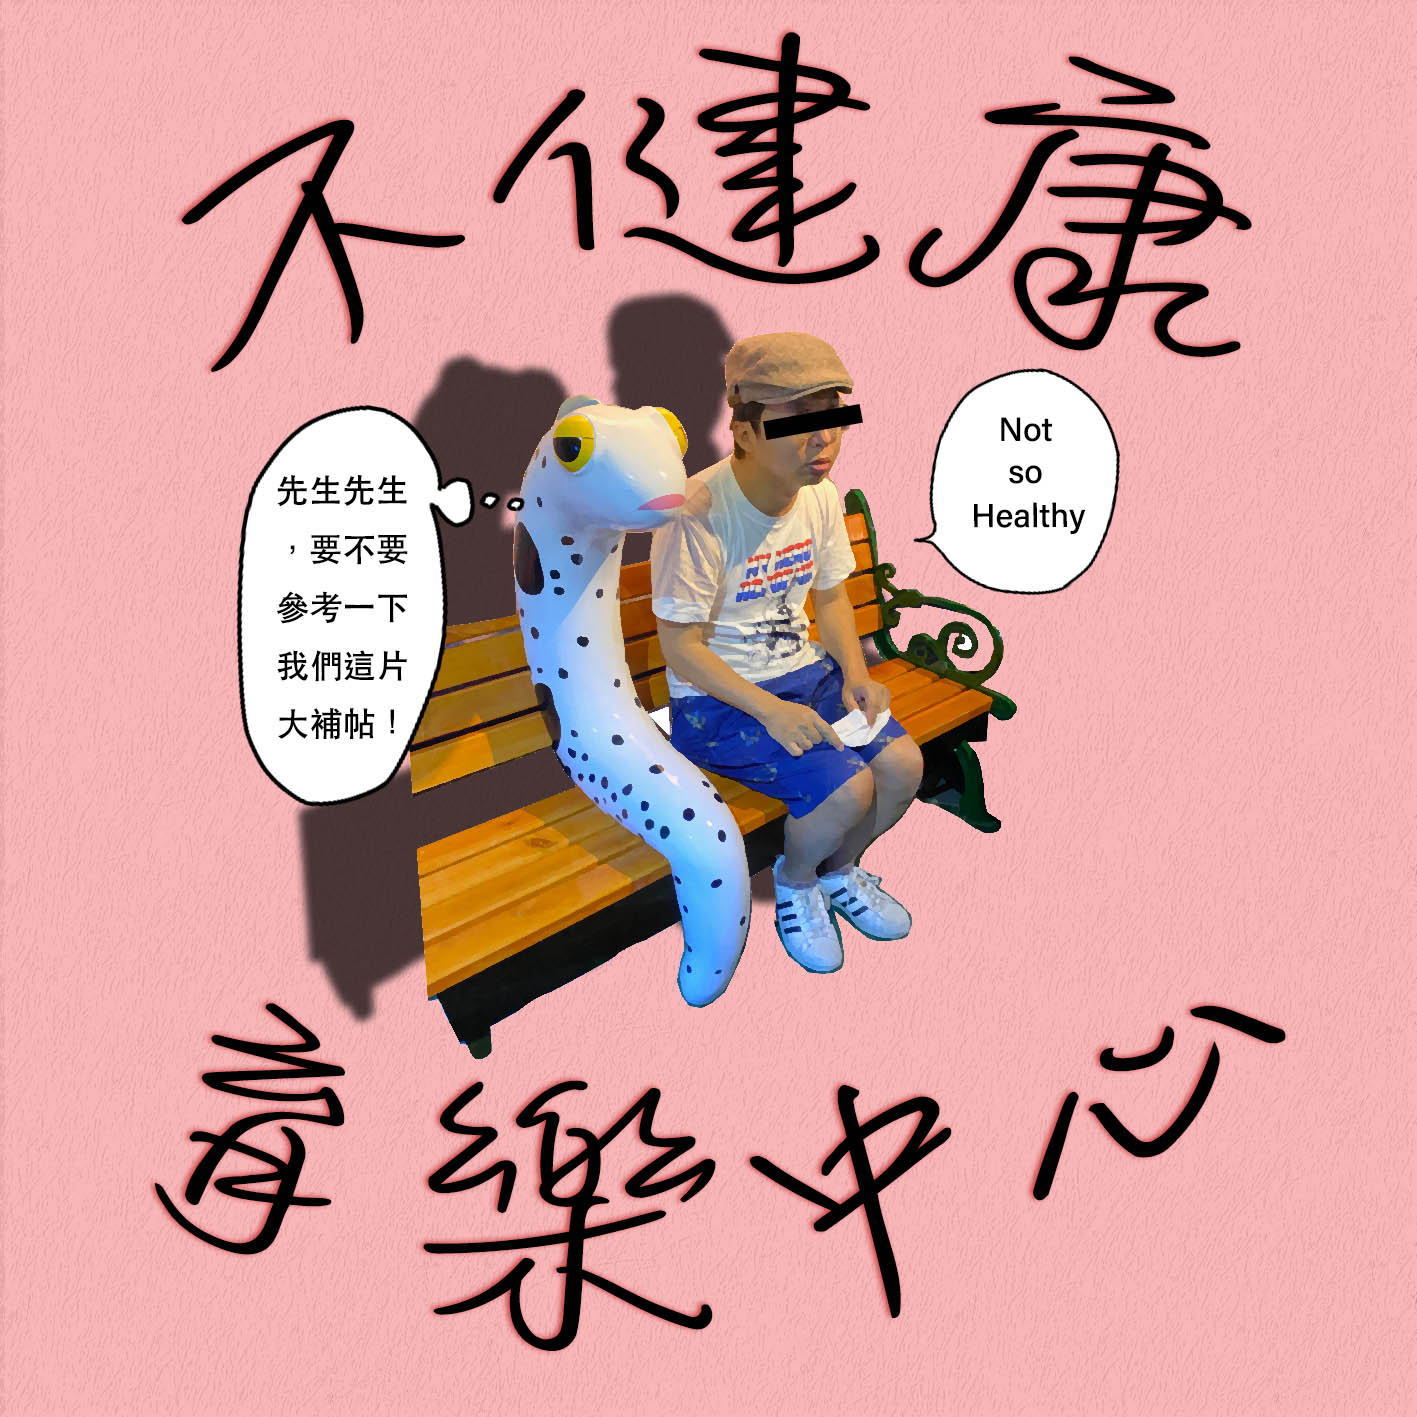 EP15 - 閒聊酒吧:在台灣,當兵就是學會製作假資料,然後和鄰兵討論肛肛好的議題!2020.10.17(下)